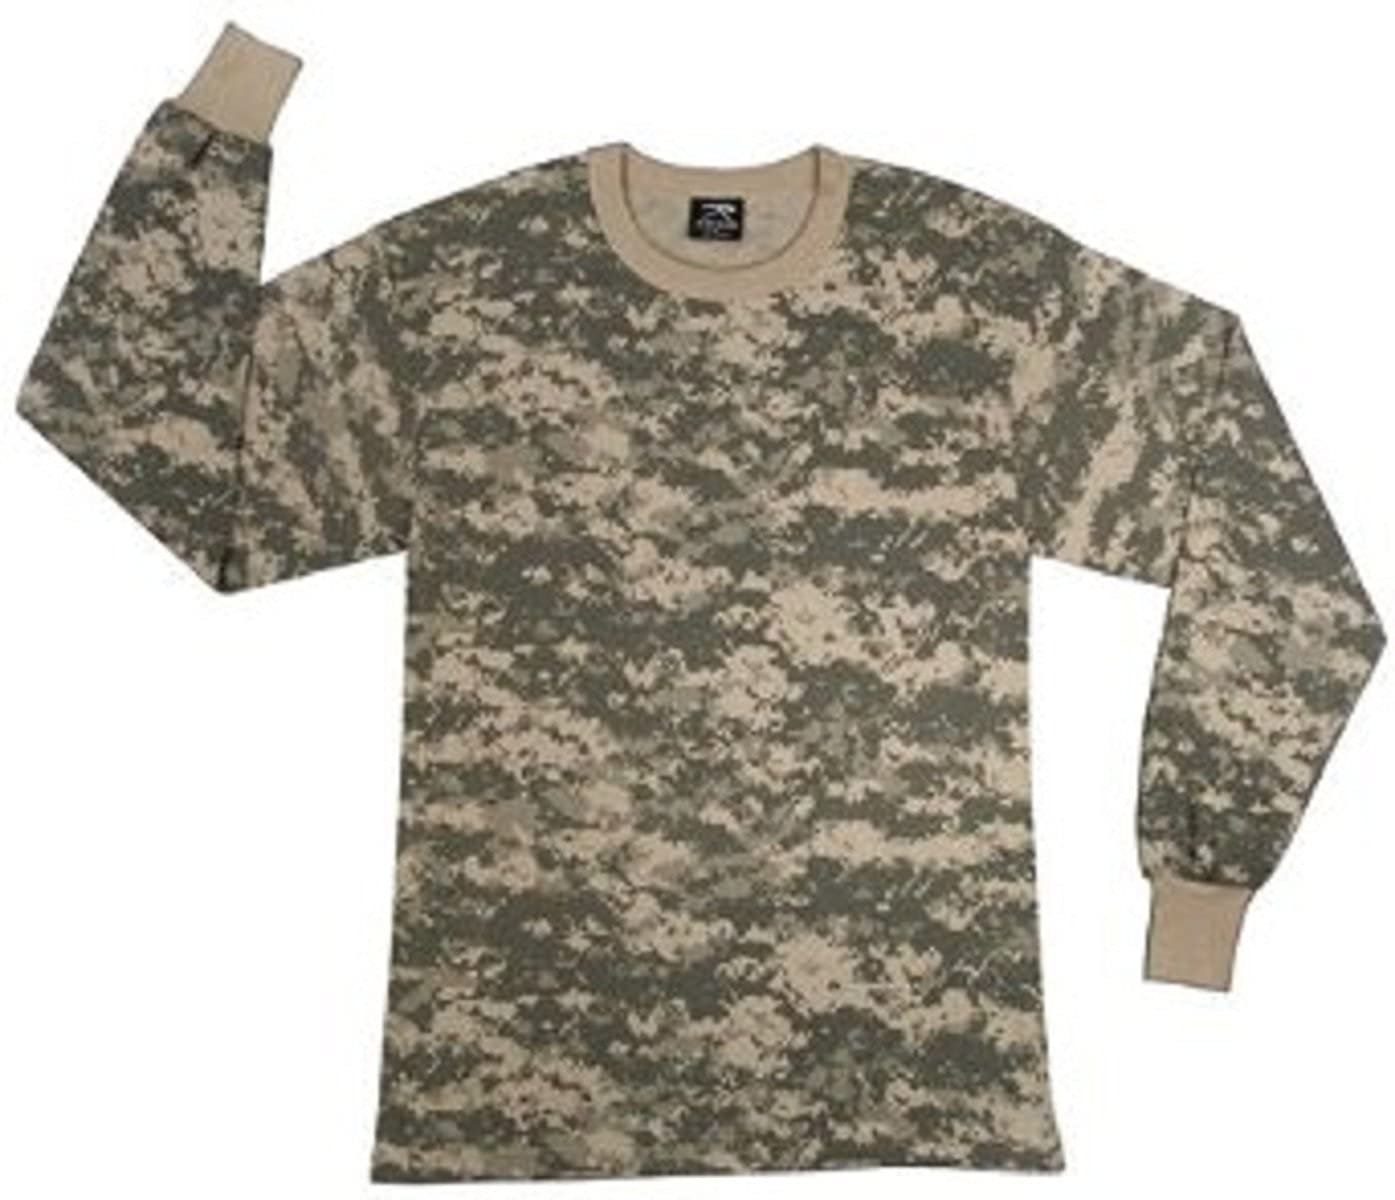 Amazon.com  Army Universe ACU Digital Camouflage Boys Long Sleeve T-Shirt  (Large)  Military Apparel Shirts  Clothing d6f0f9069